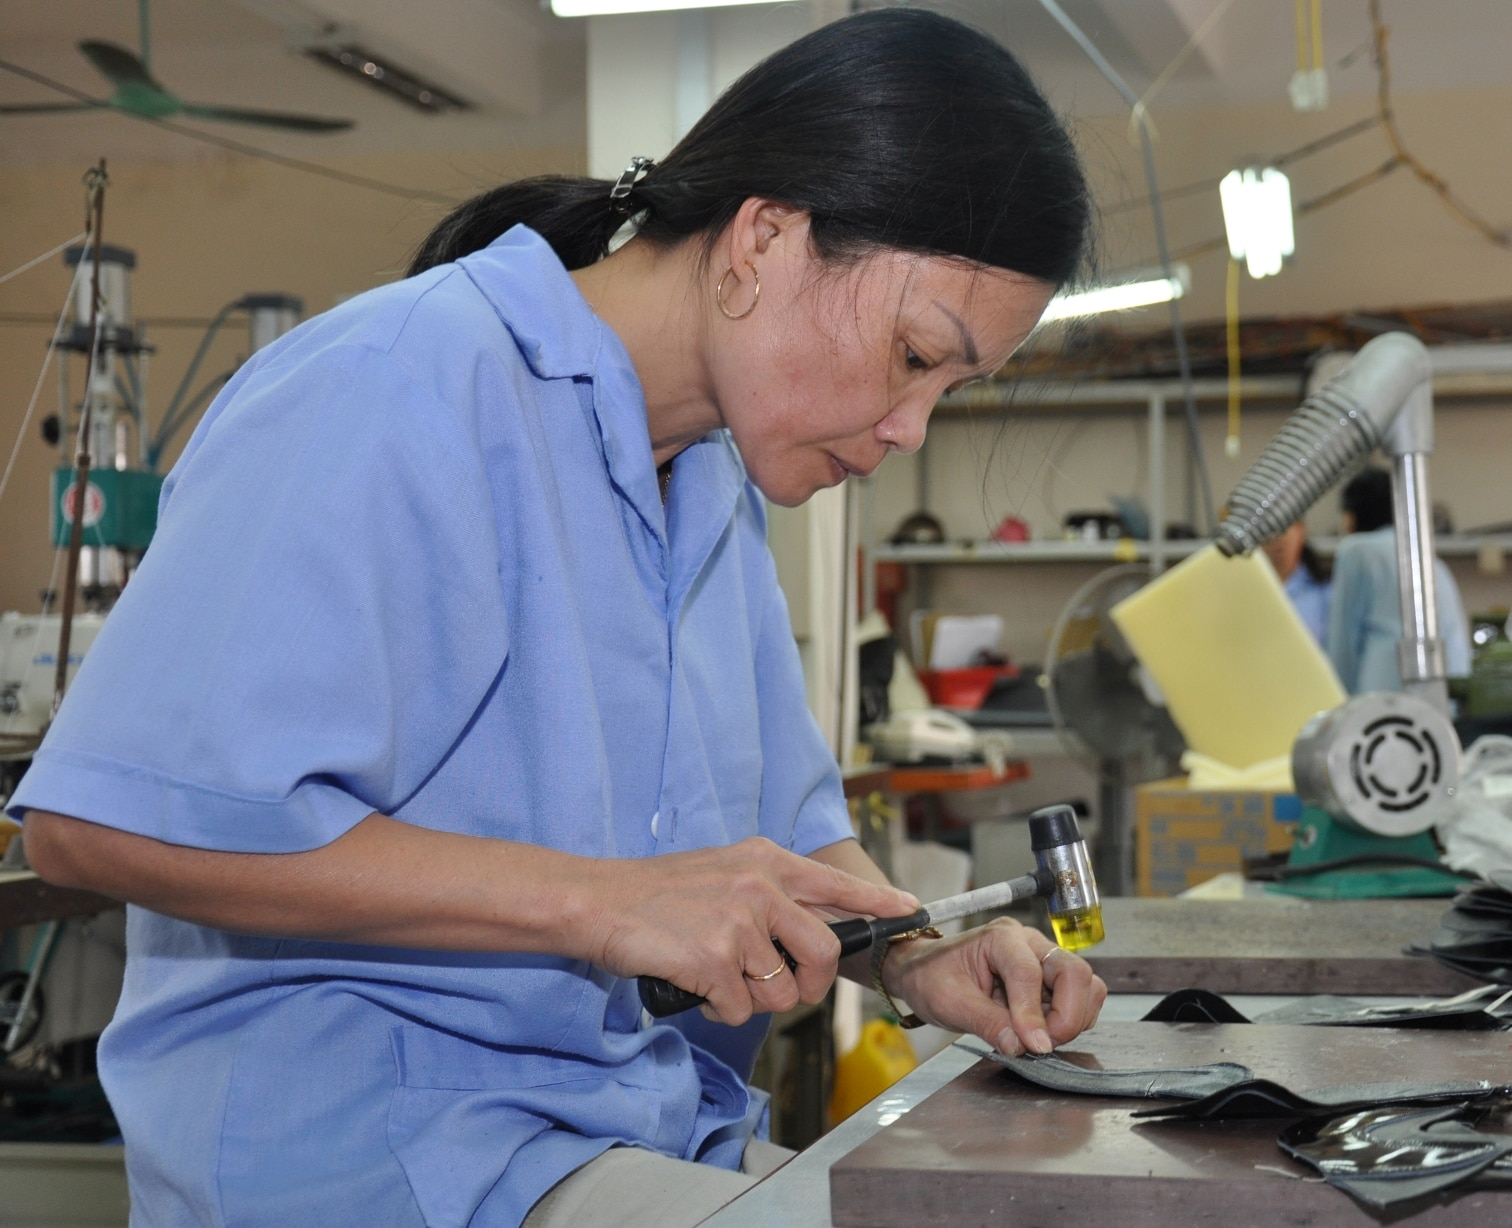 Une femme travaille à une table (USAID/Richard Nyberg)